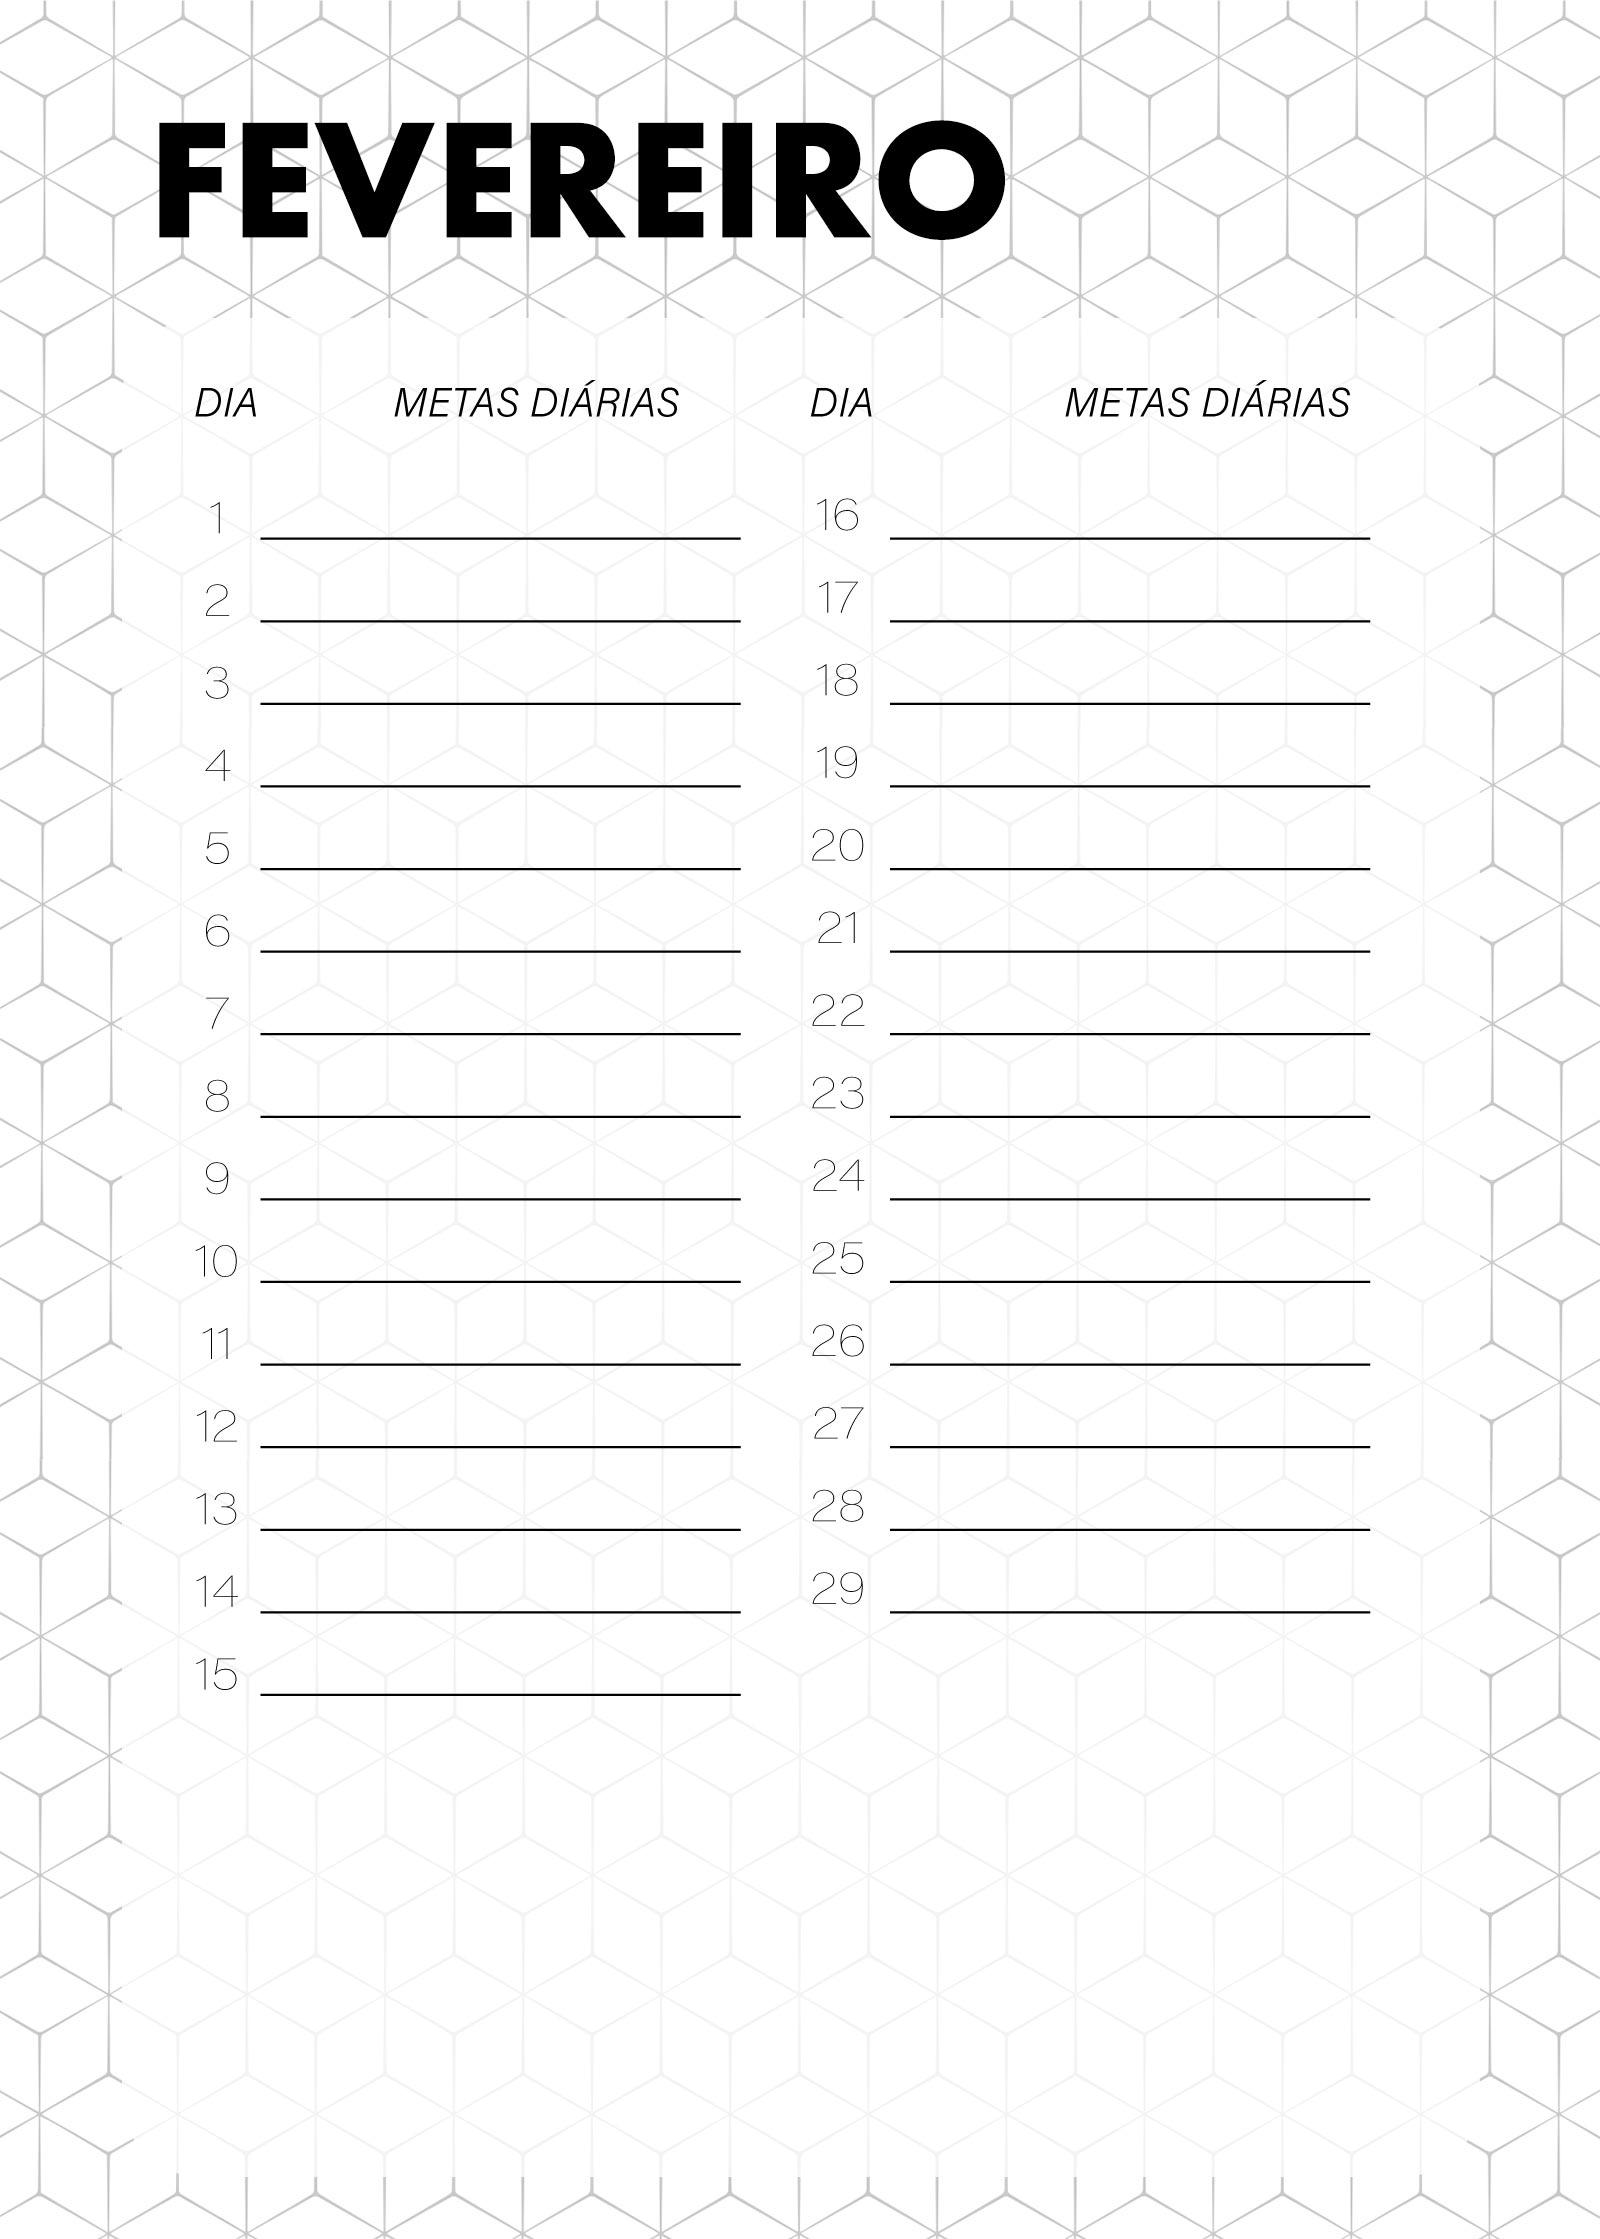 Planner Preto e Branco Metas Diarias Fevereiro